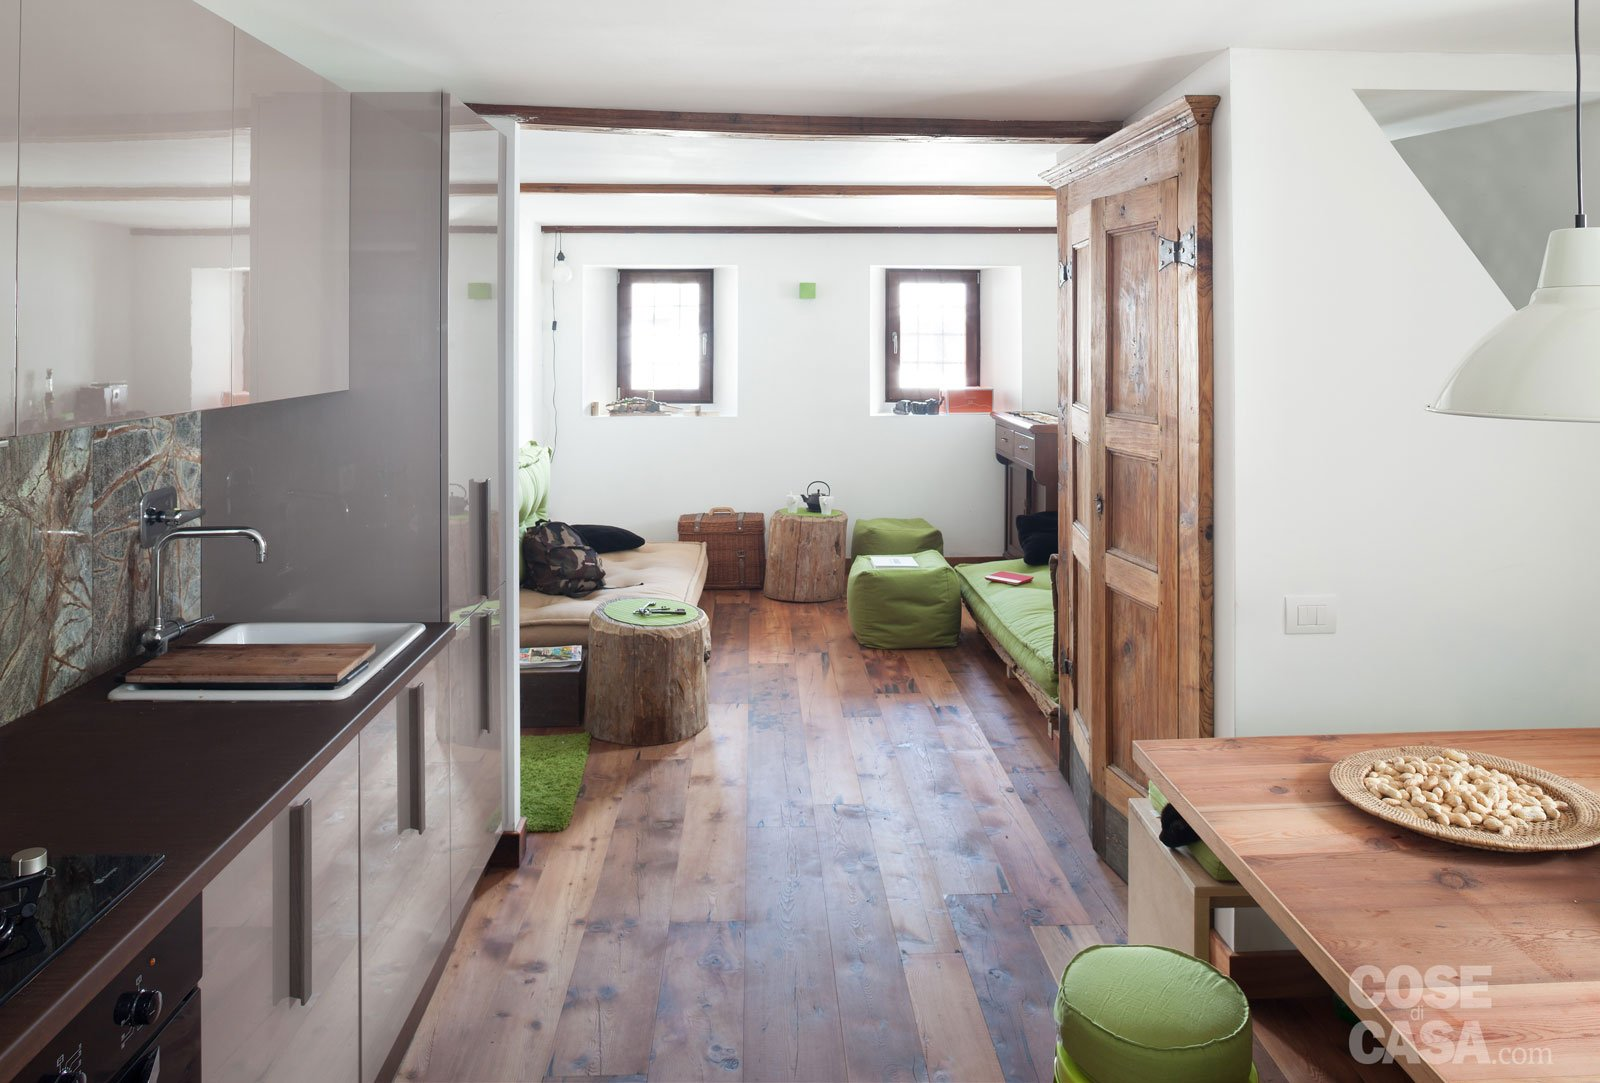 30 30 mq restauro di una tipica casa di montagna cose - Cucina per casa ...